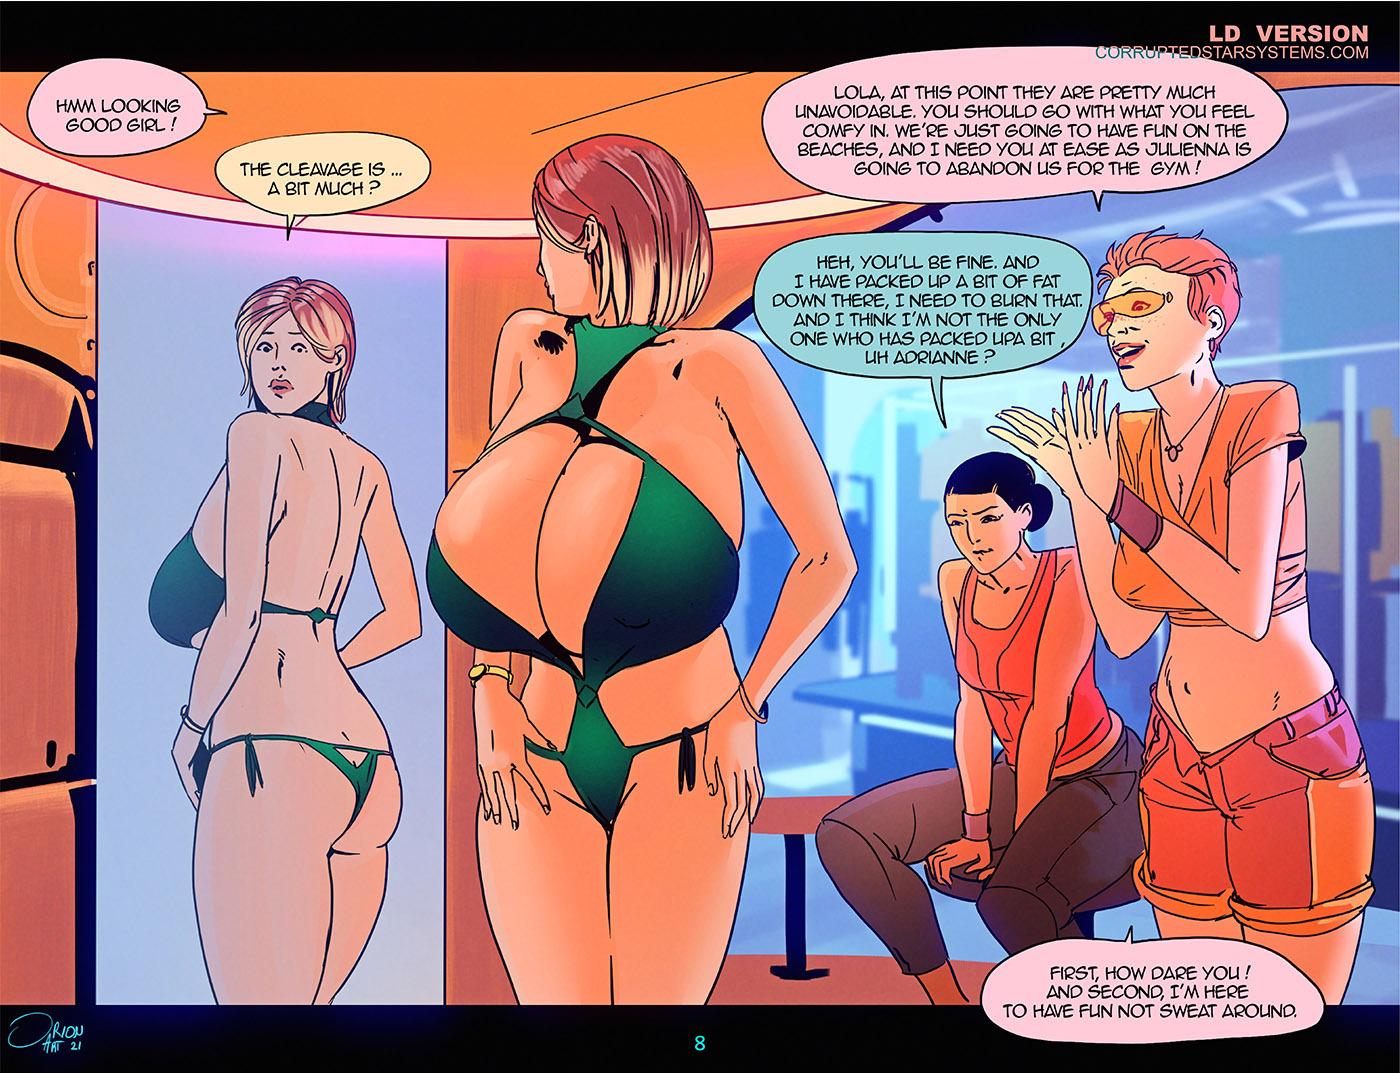 Lola's Breast Crisis